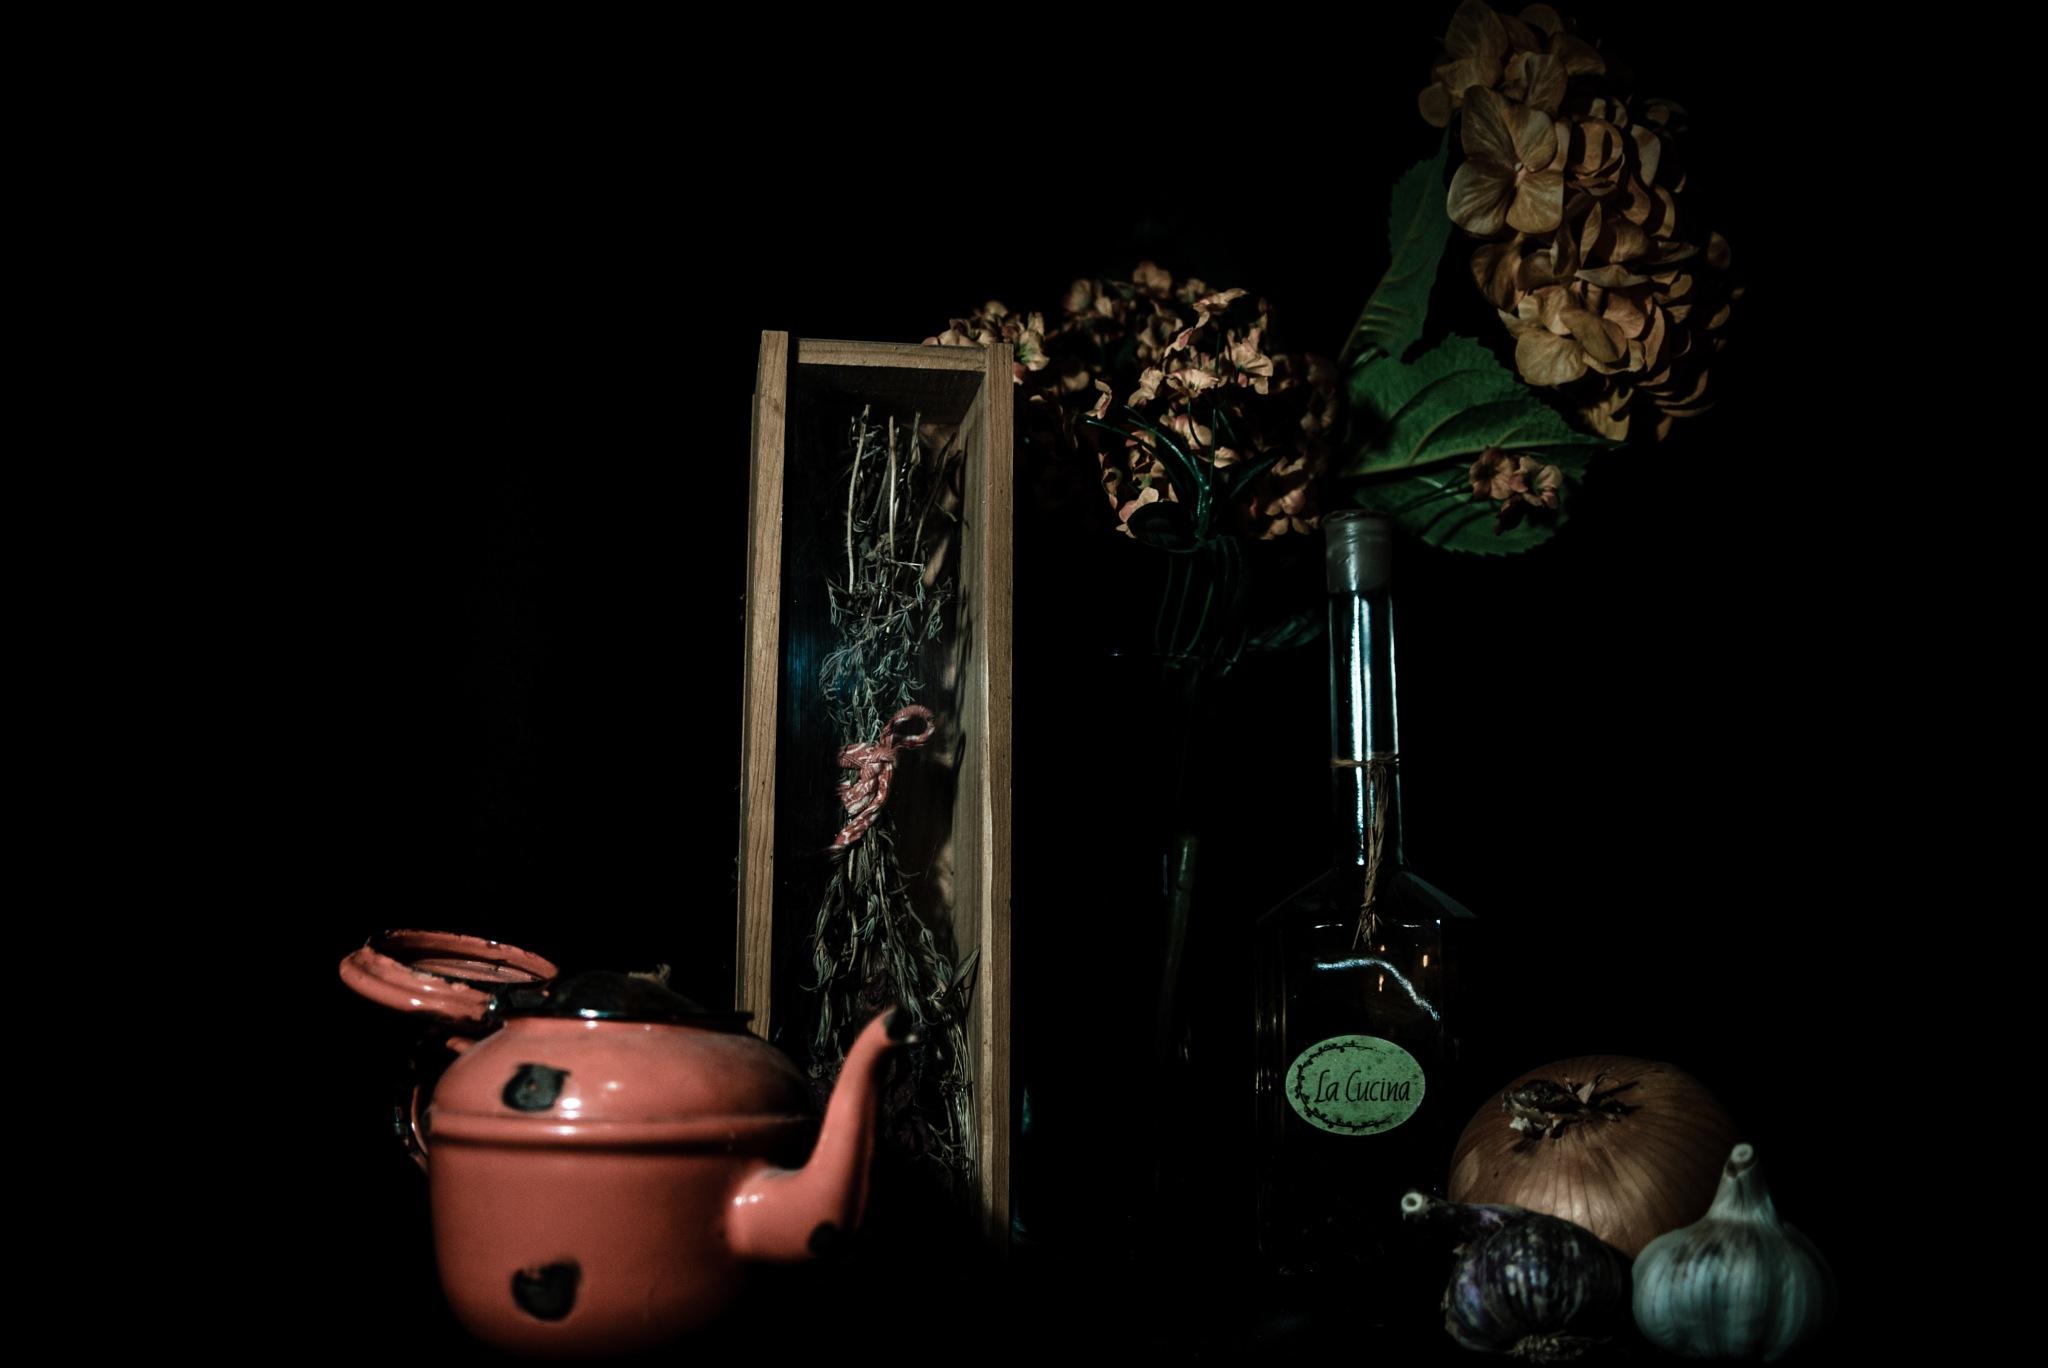 Untitled by ALMARIA